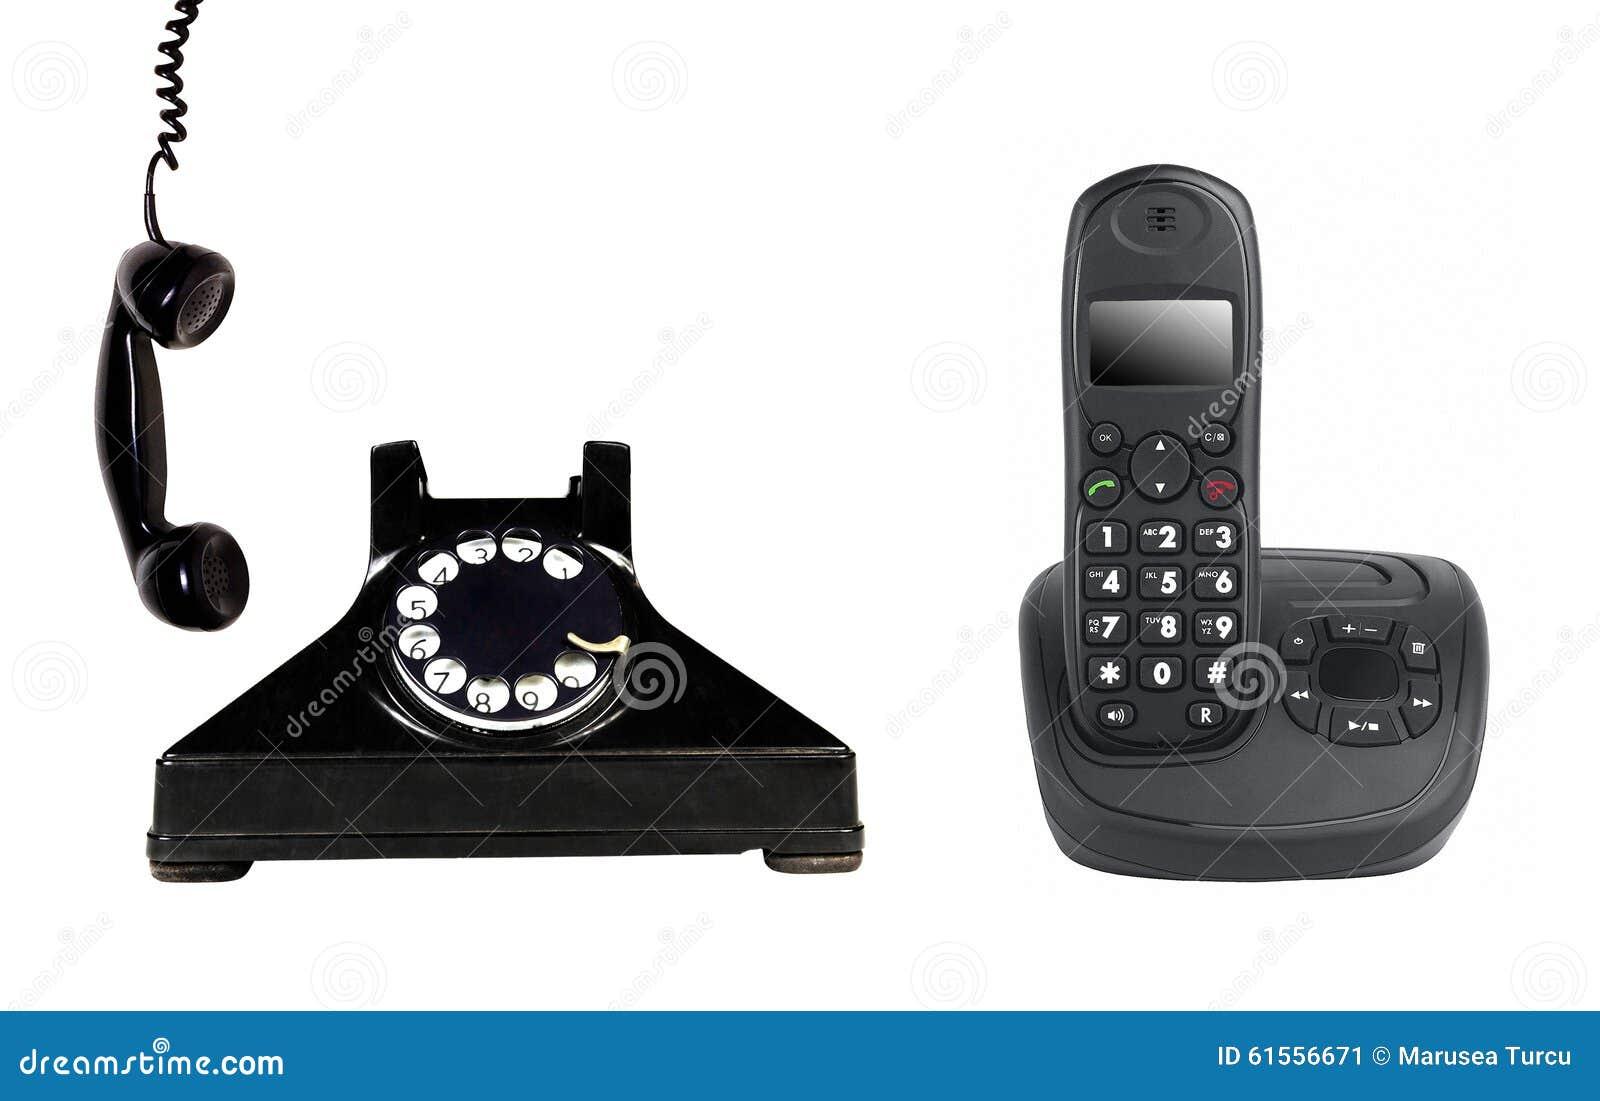 Vintage and modern phone